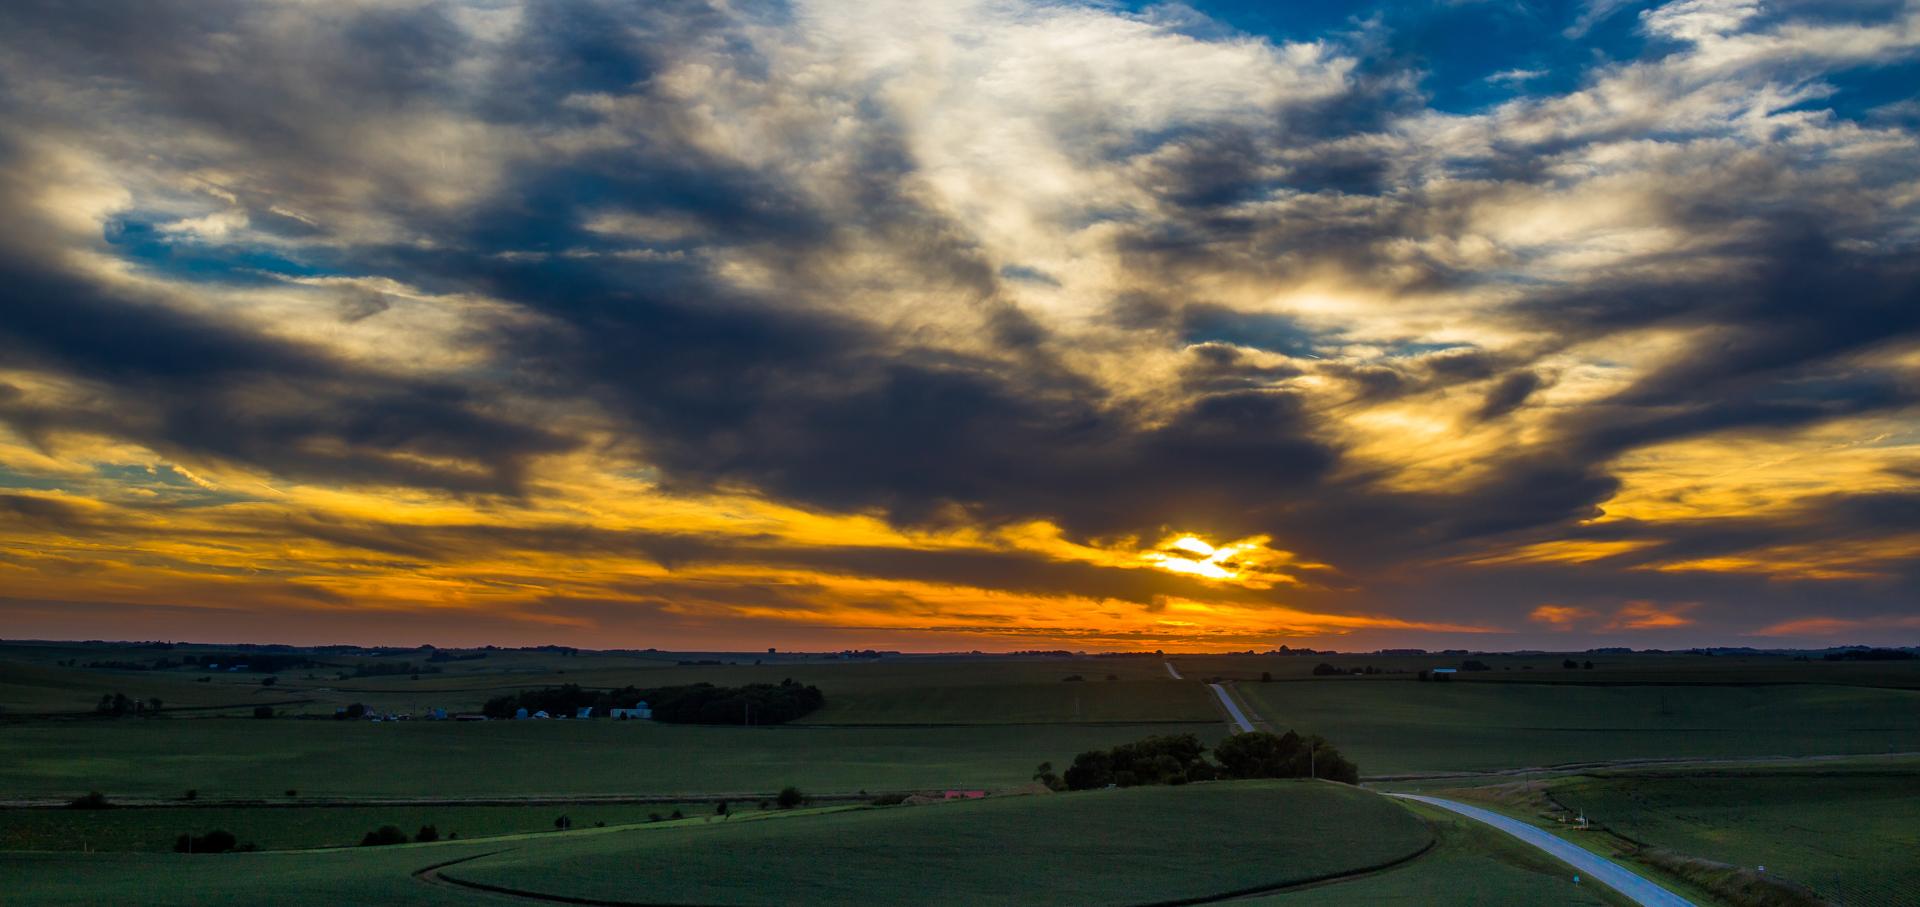 Lyons, NE Sunset